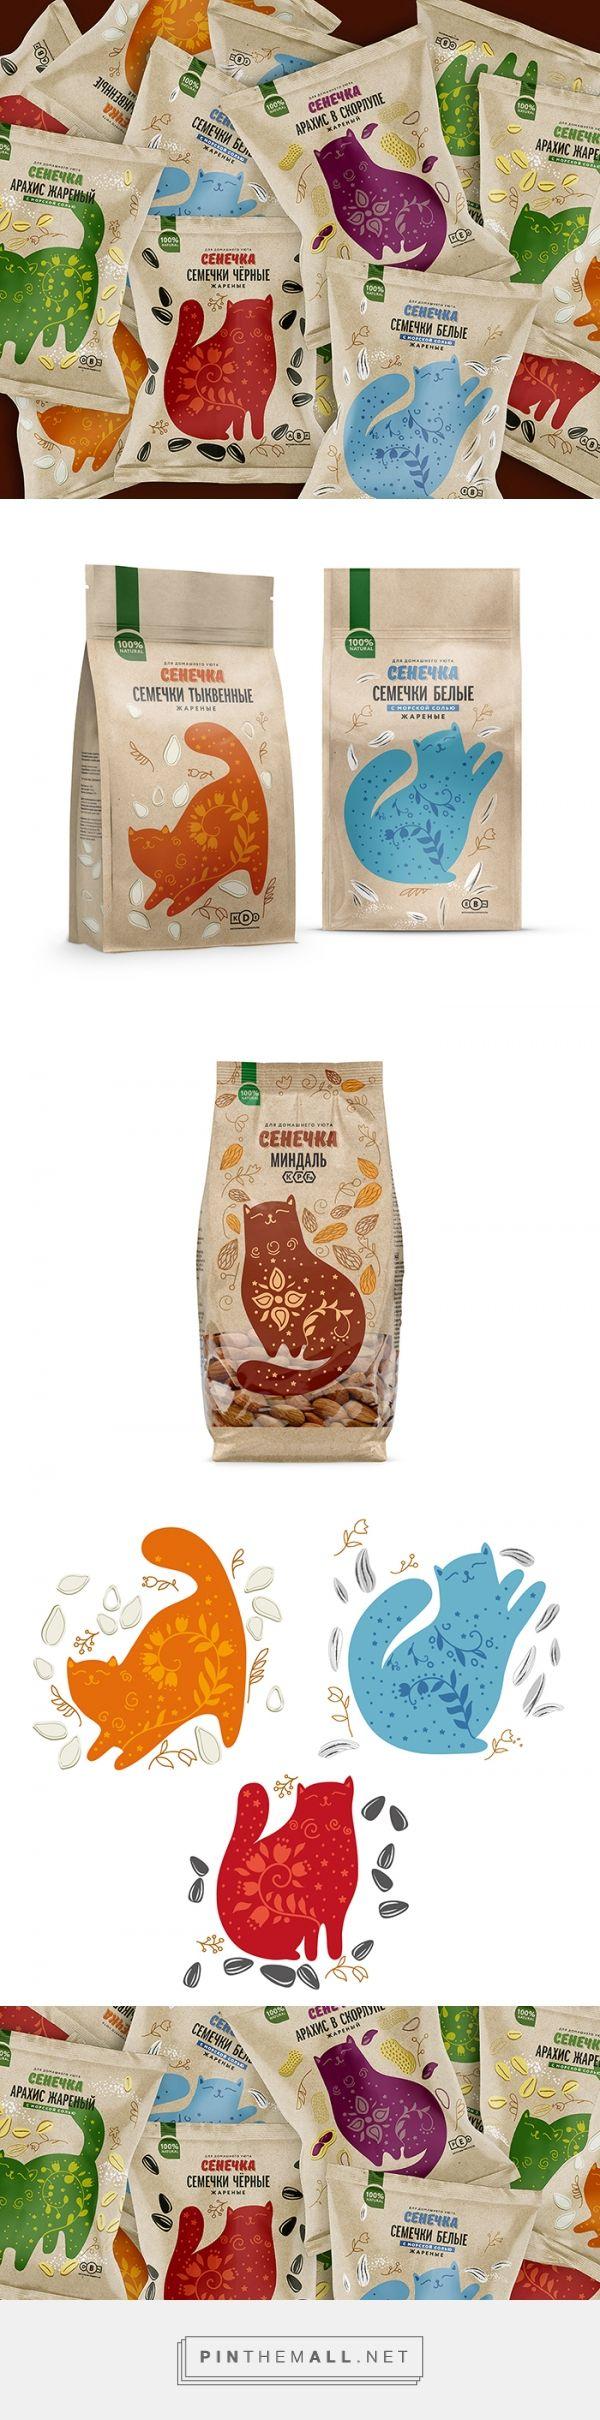 Senechka | nuts packaging | designed by Ohmybrand